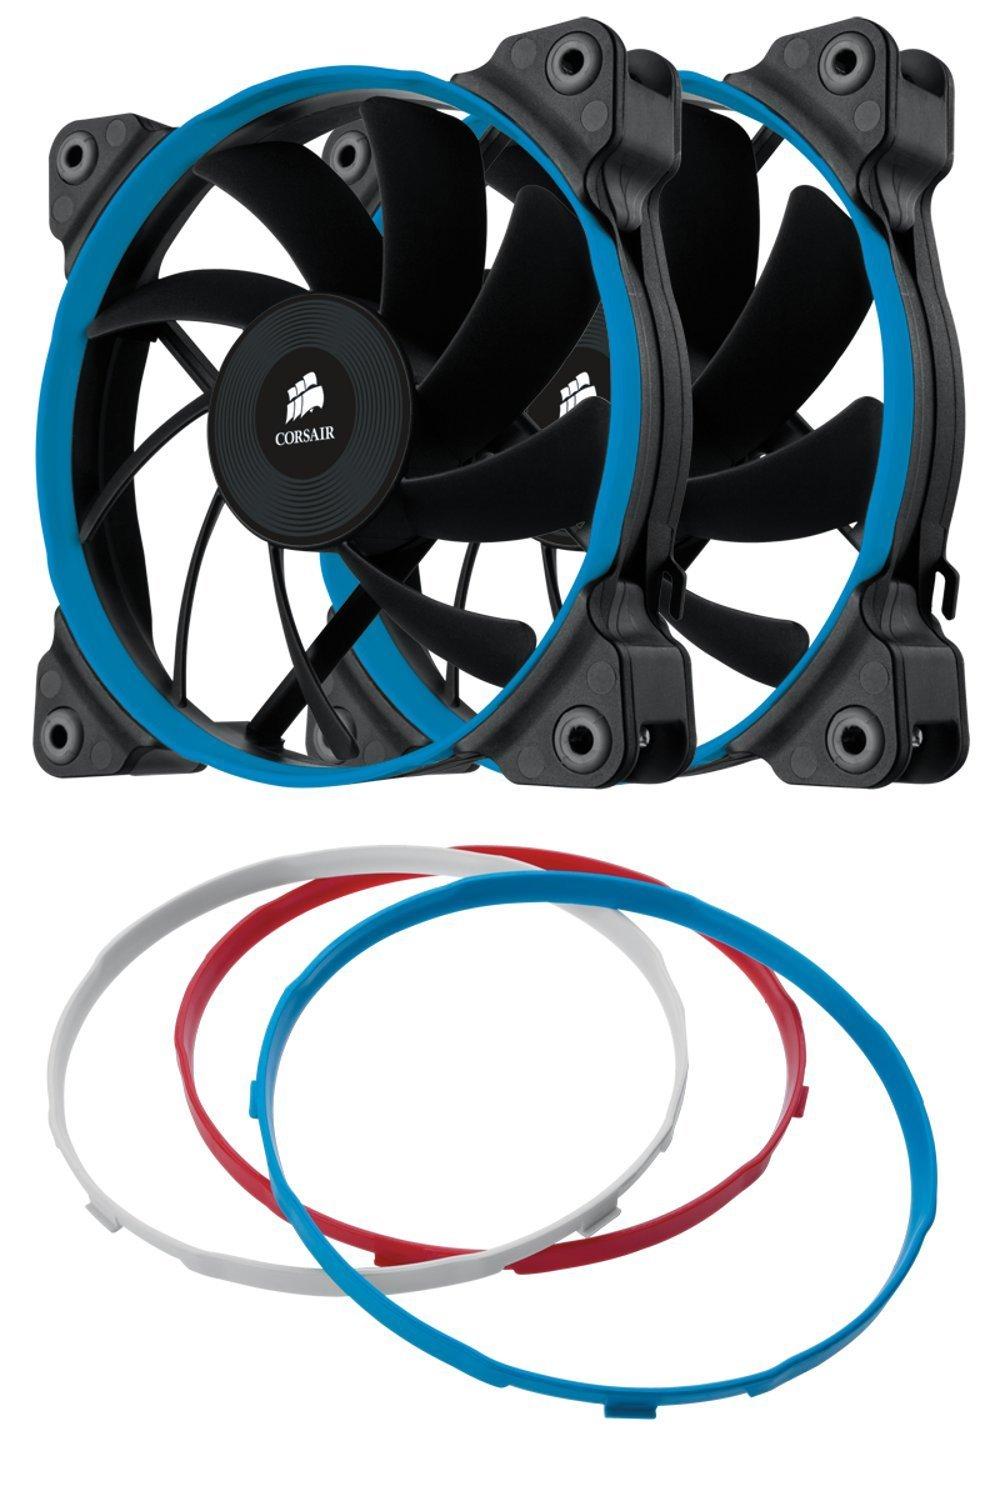 Corsair Case Fan AF120 120mm CO-9050004-WW ventilators